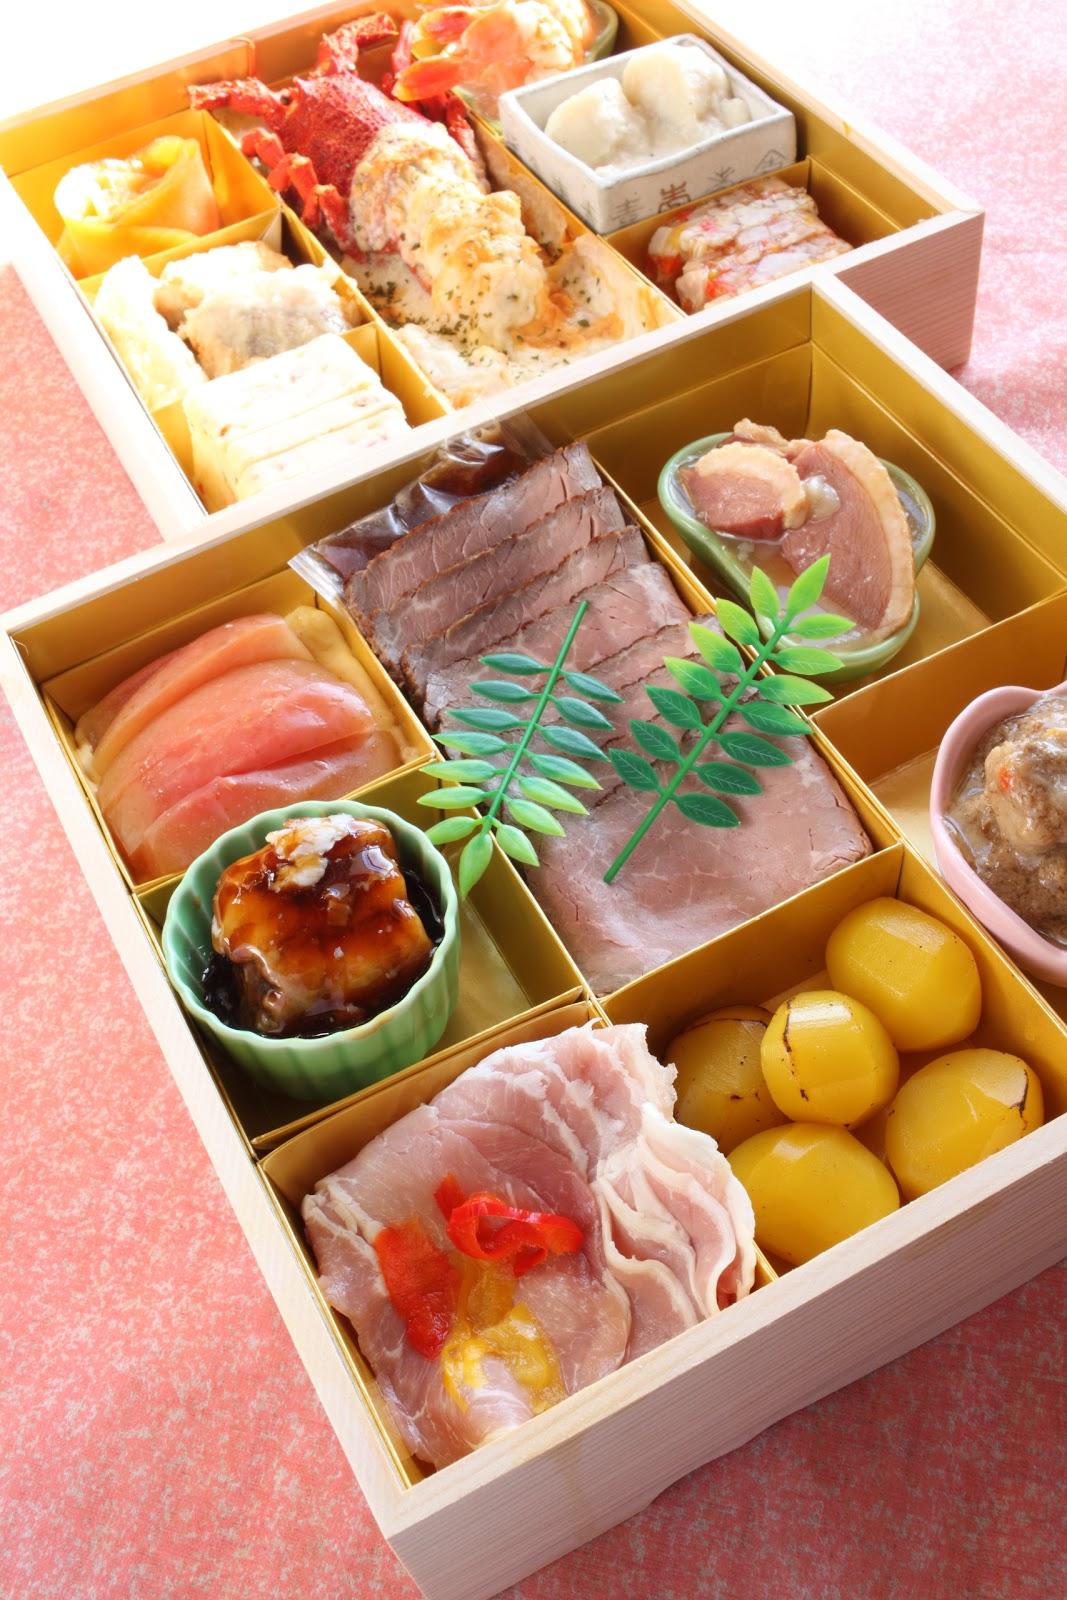 Leben in japan japanisches neujahrs essen osechi ryori tokio yokohama - Cuisine japonaise traditionnelle ...